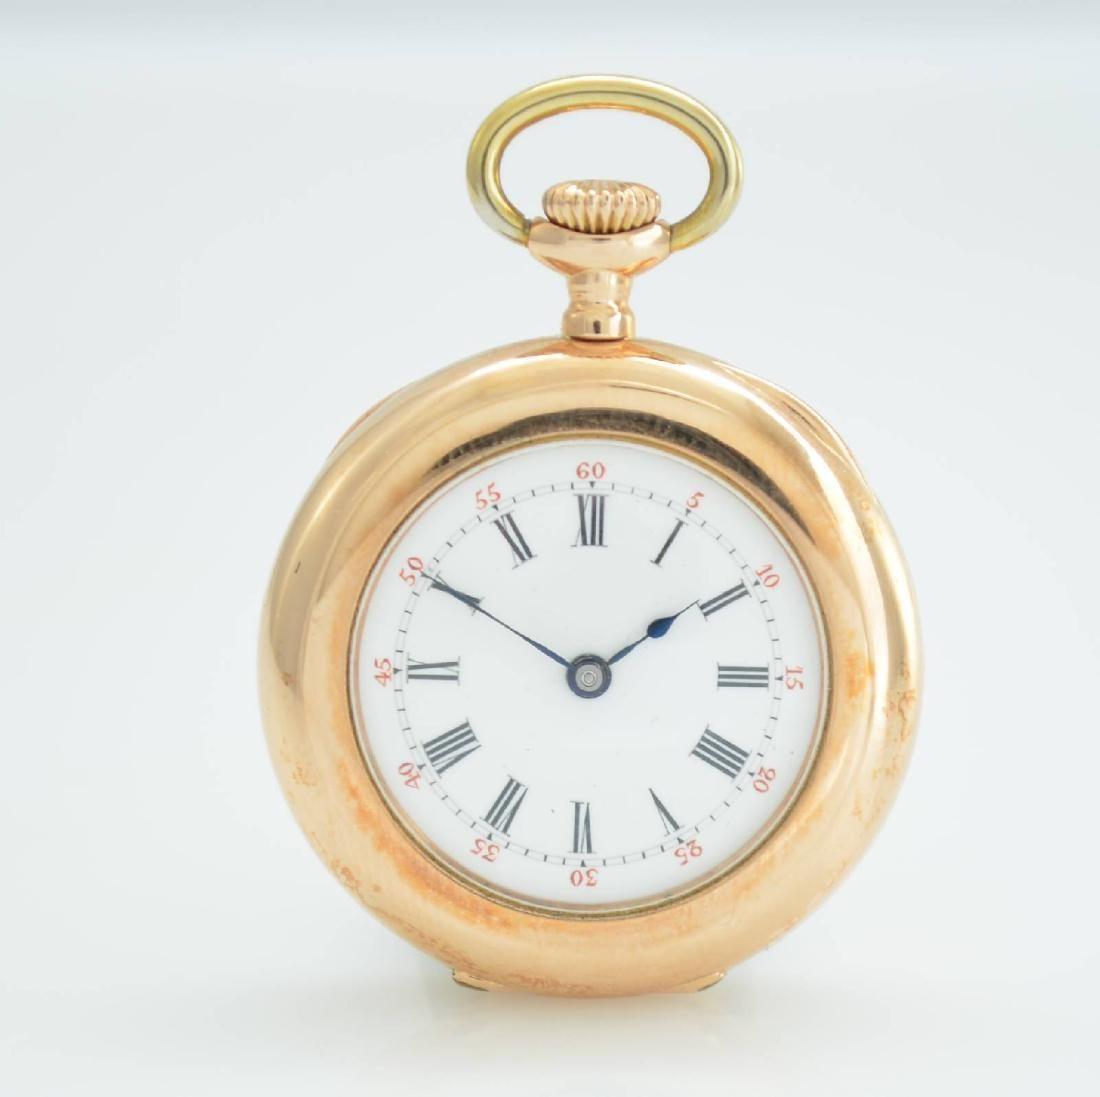 PATEK PHILIPPE & CO rare 18k gold ladies pocket watch